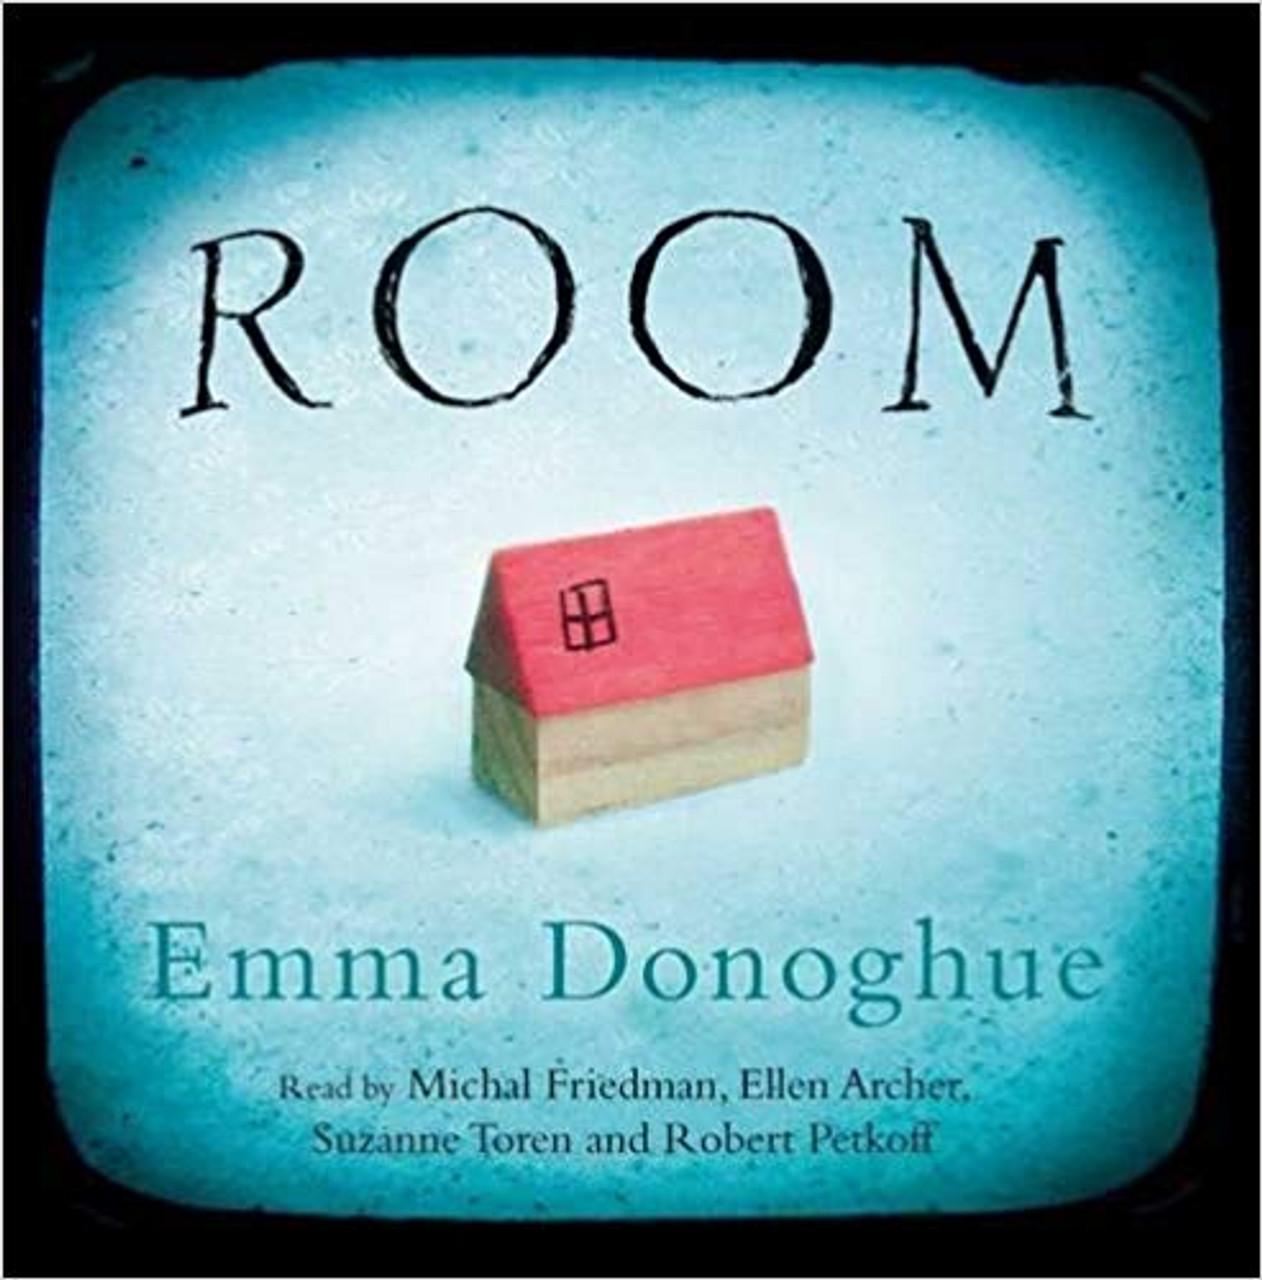 Donoghue, Emma - Room -AUDIO Book - 9 Cd Set - Sealed As New